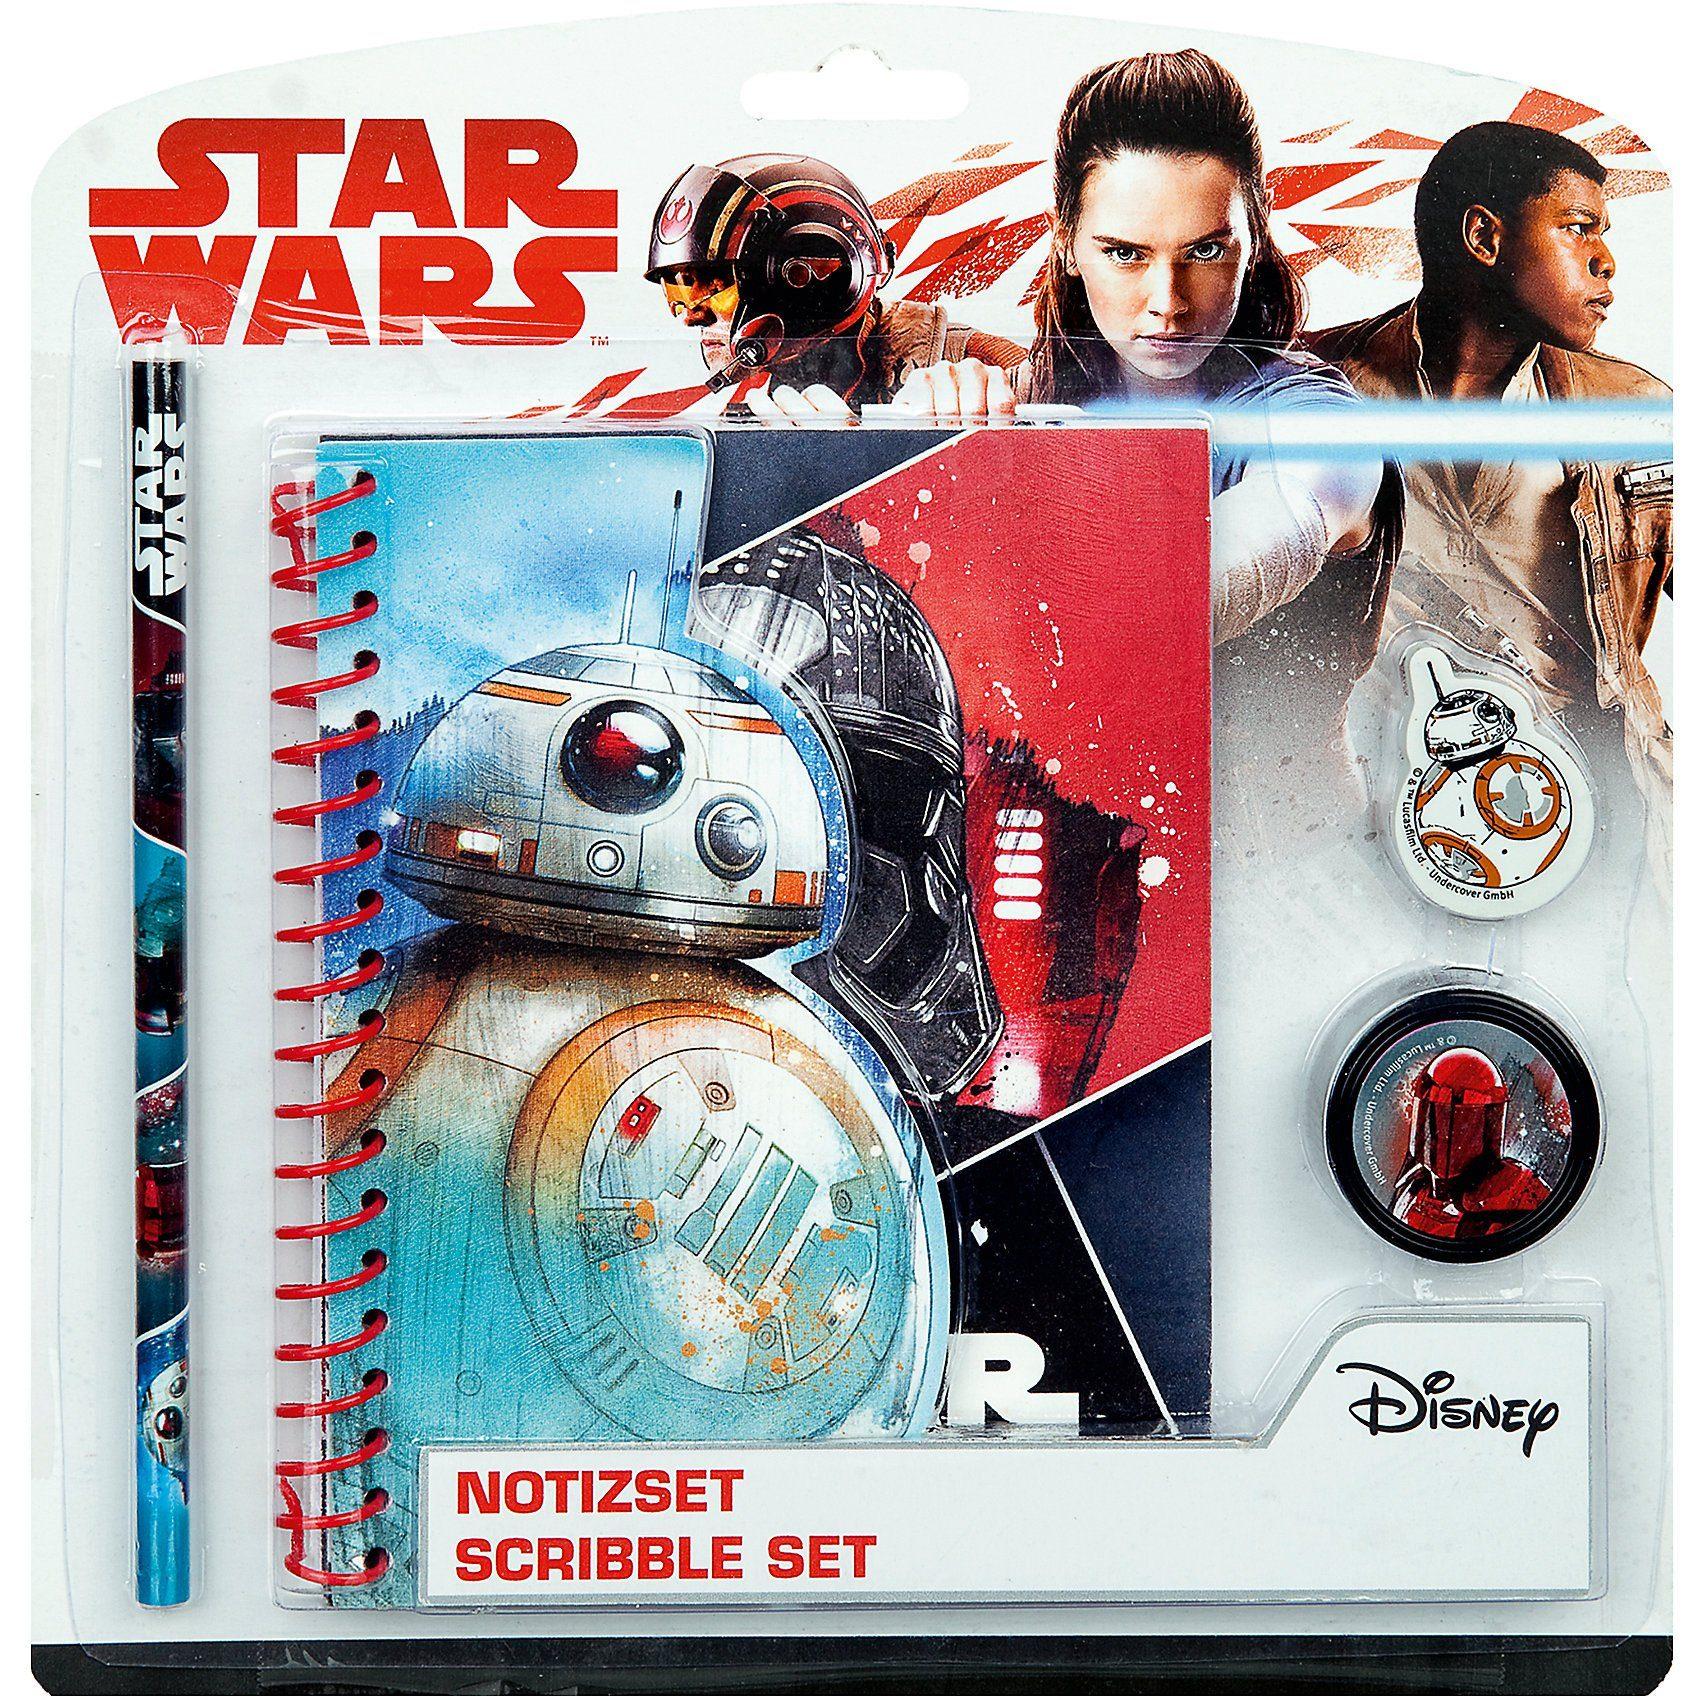 UNDERCOVER Notizset Star Wars, 4-tlg.